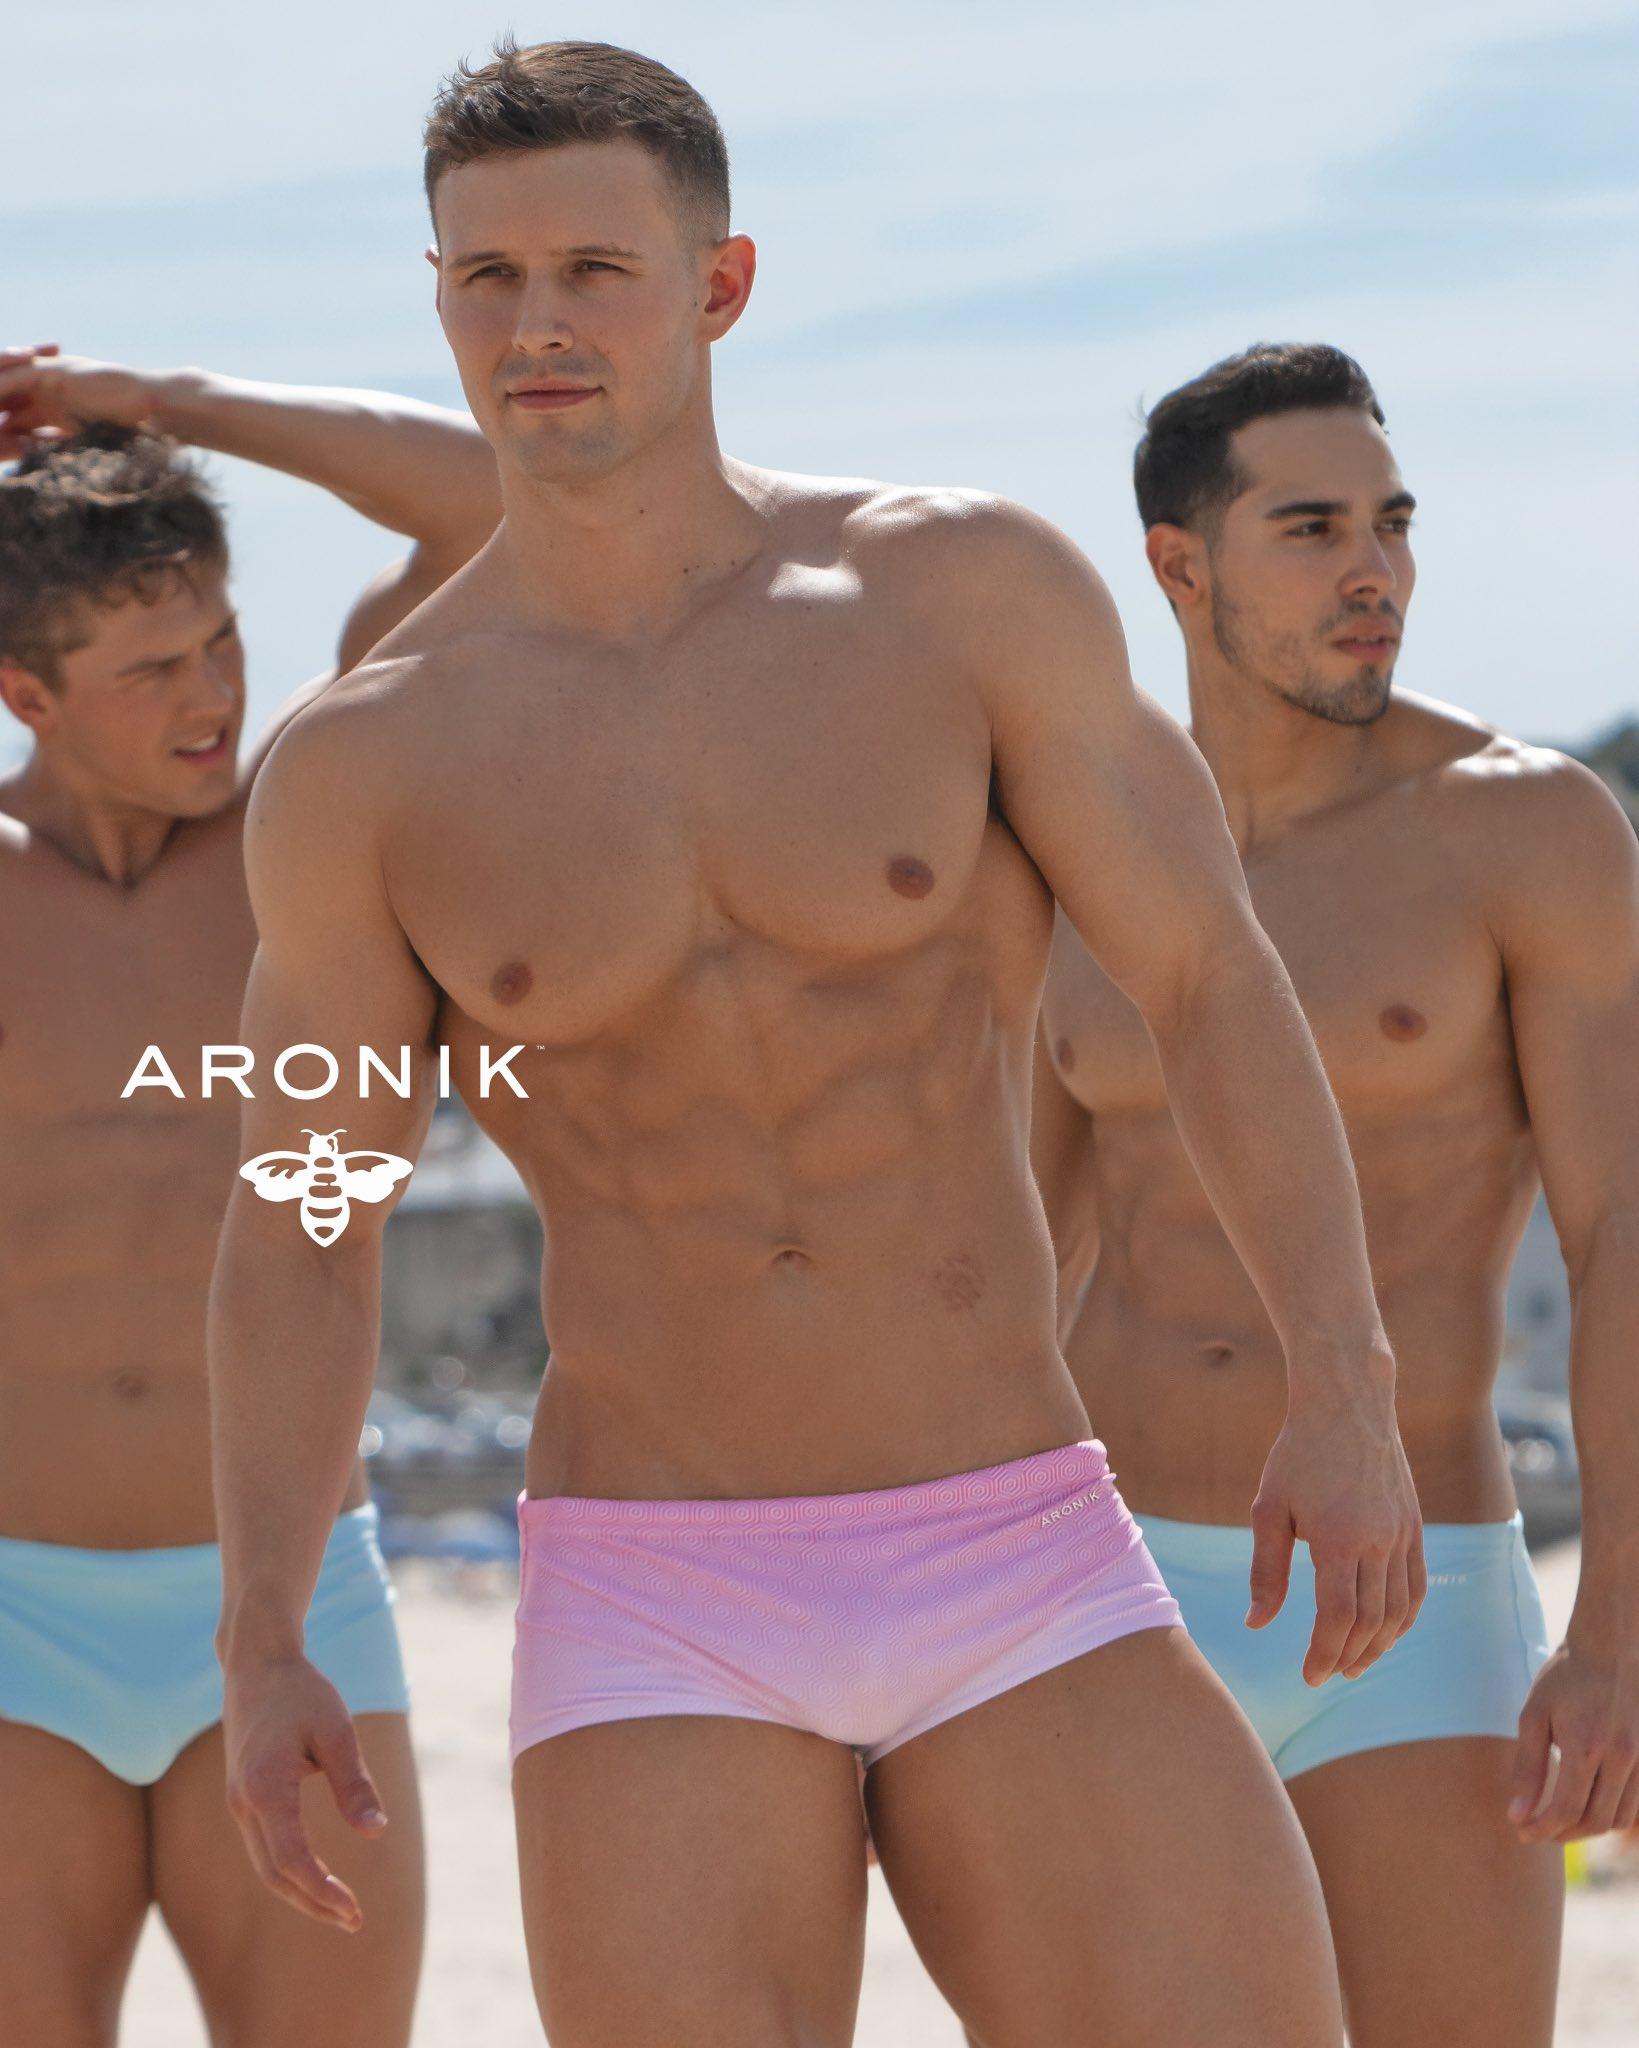 Brief Distraction featuring Aronik